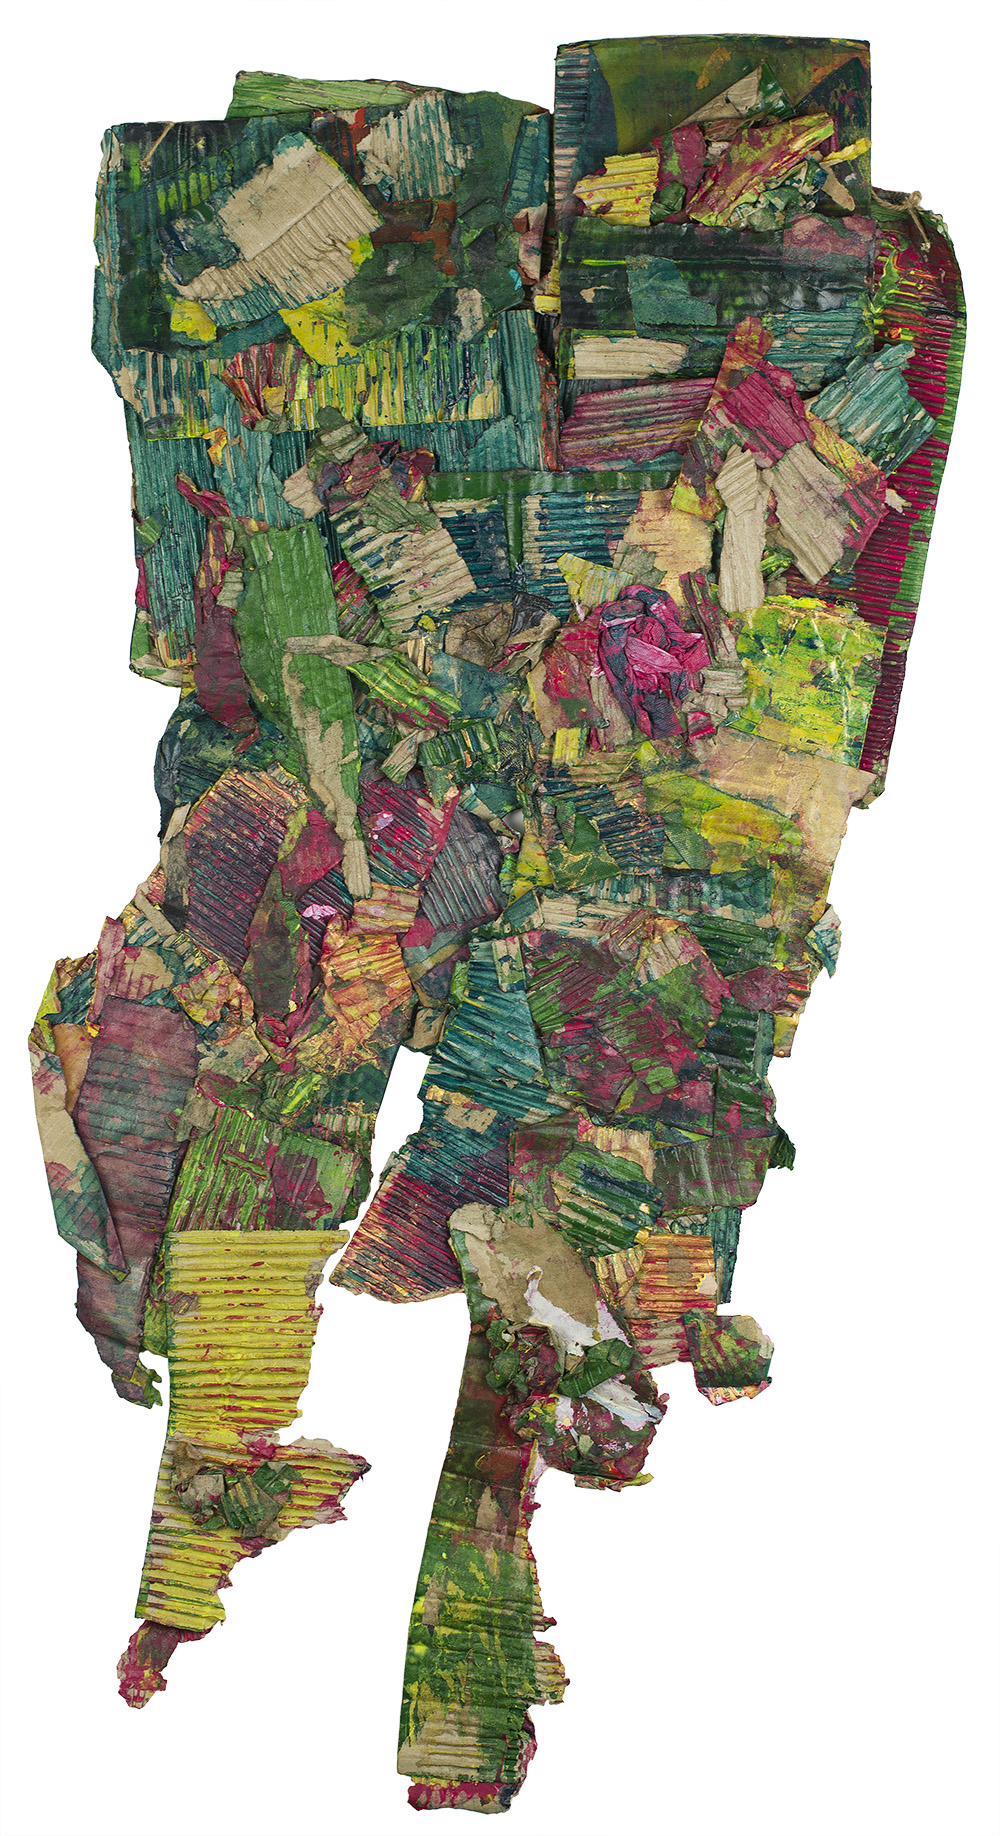 Katsuo Tokunaga    Plants   Collage 48 x 20 inches 121.9 x 50.8 cm KaT 1